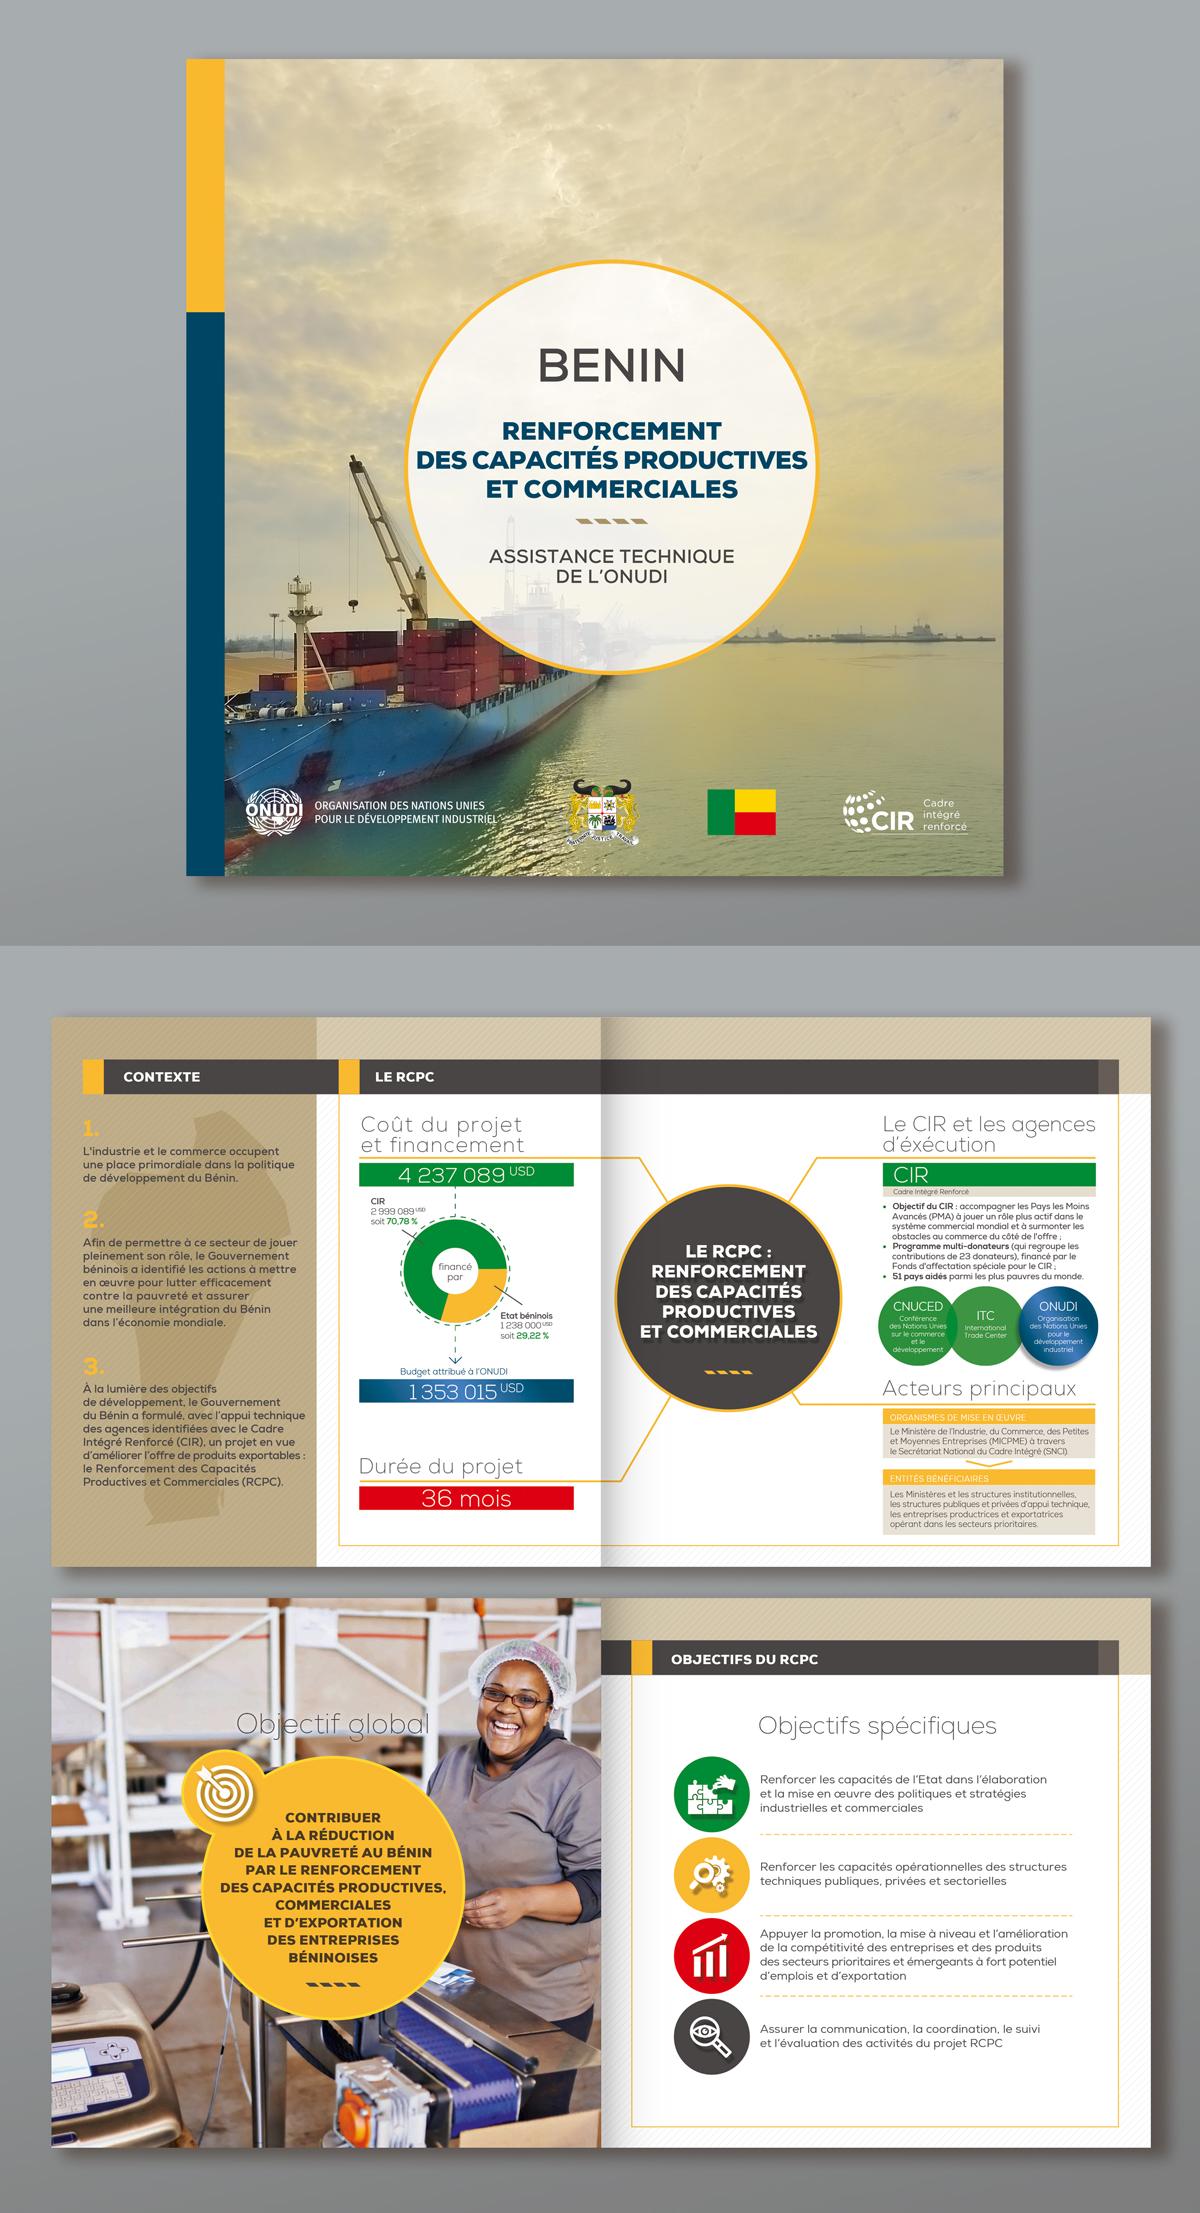 edition-onudi-brochure-benin-complet